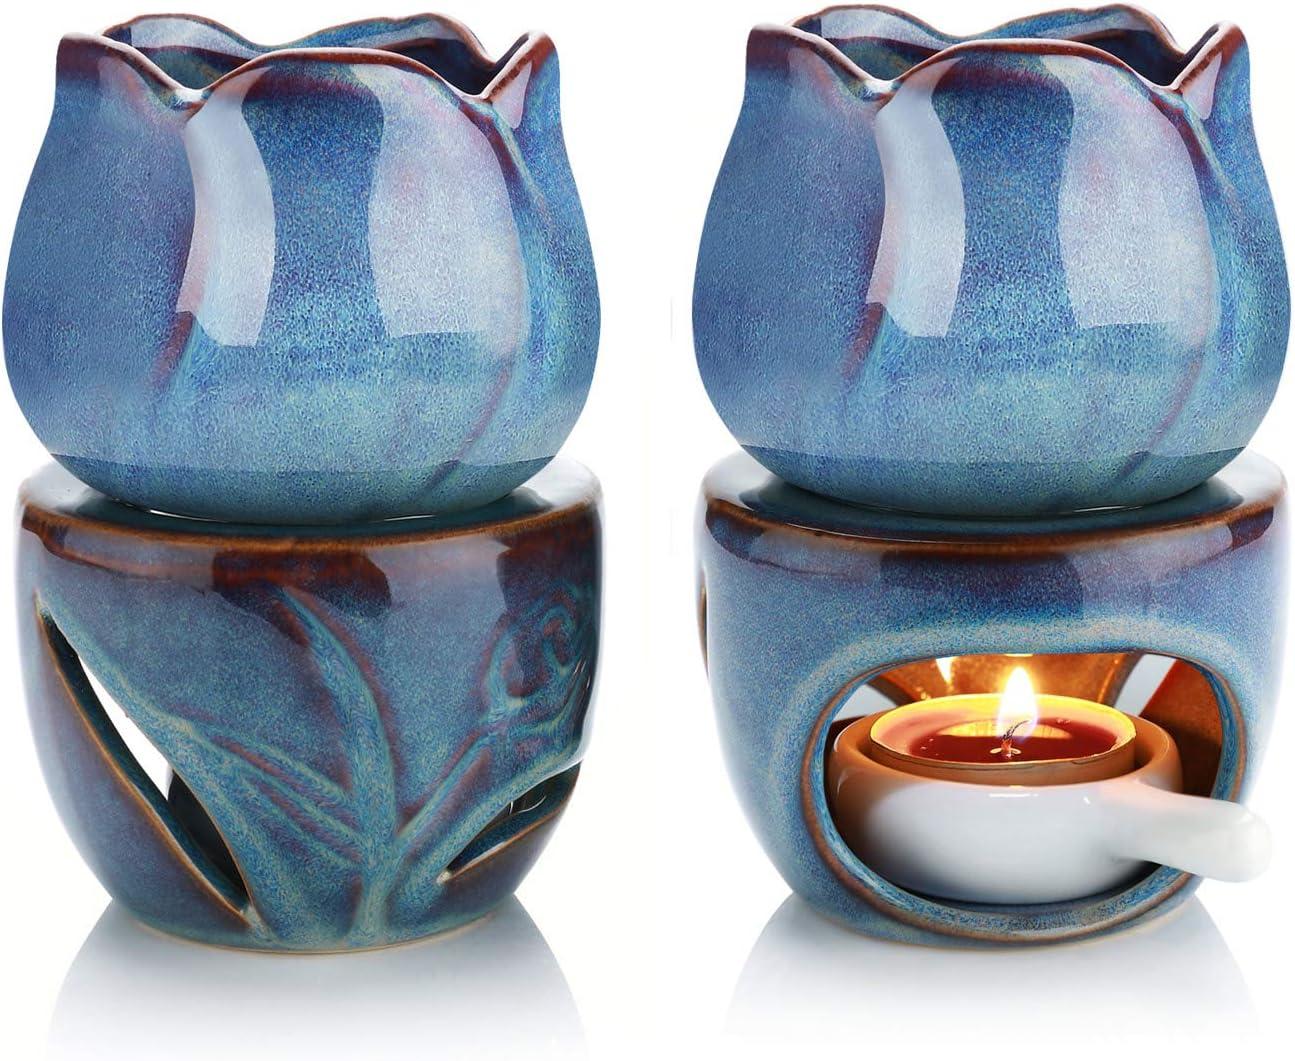 ComSaf Wax Melt Burners Essential Oil Burner Set of 2, Aromatherapy Aroma Burner Ceramic Oil Diffuser Candle Tealight Holder Home Bedroom Decor Christmas Housewarming Gift